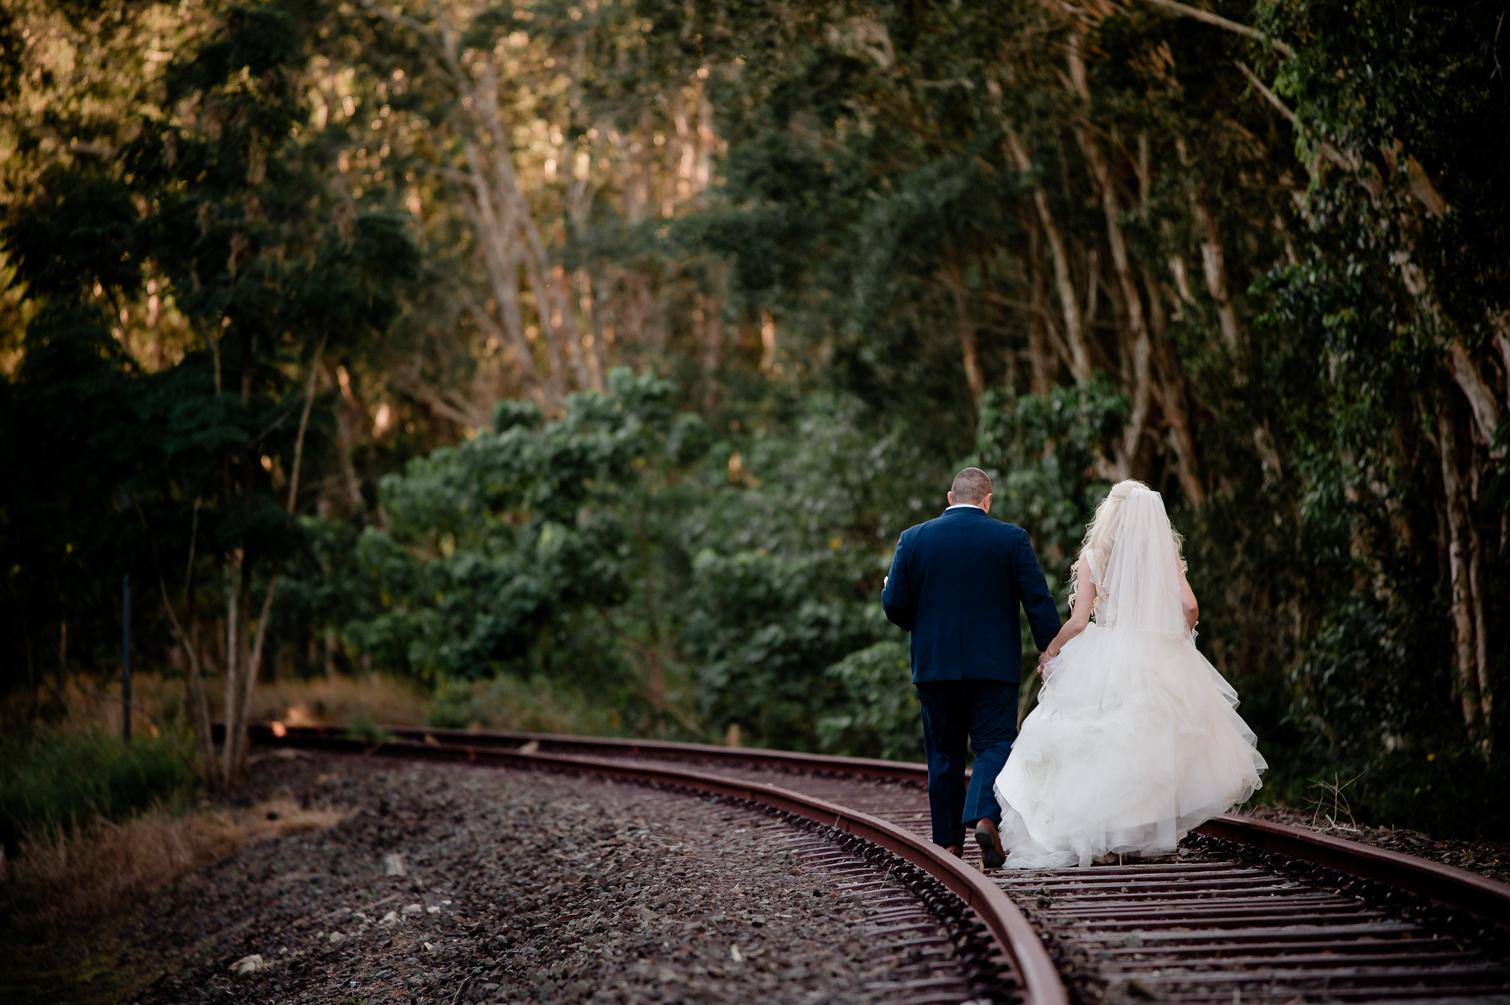 The_Belongil_Byron_Bay_Weddings_New_Black_Studios-110.jpg